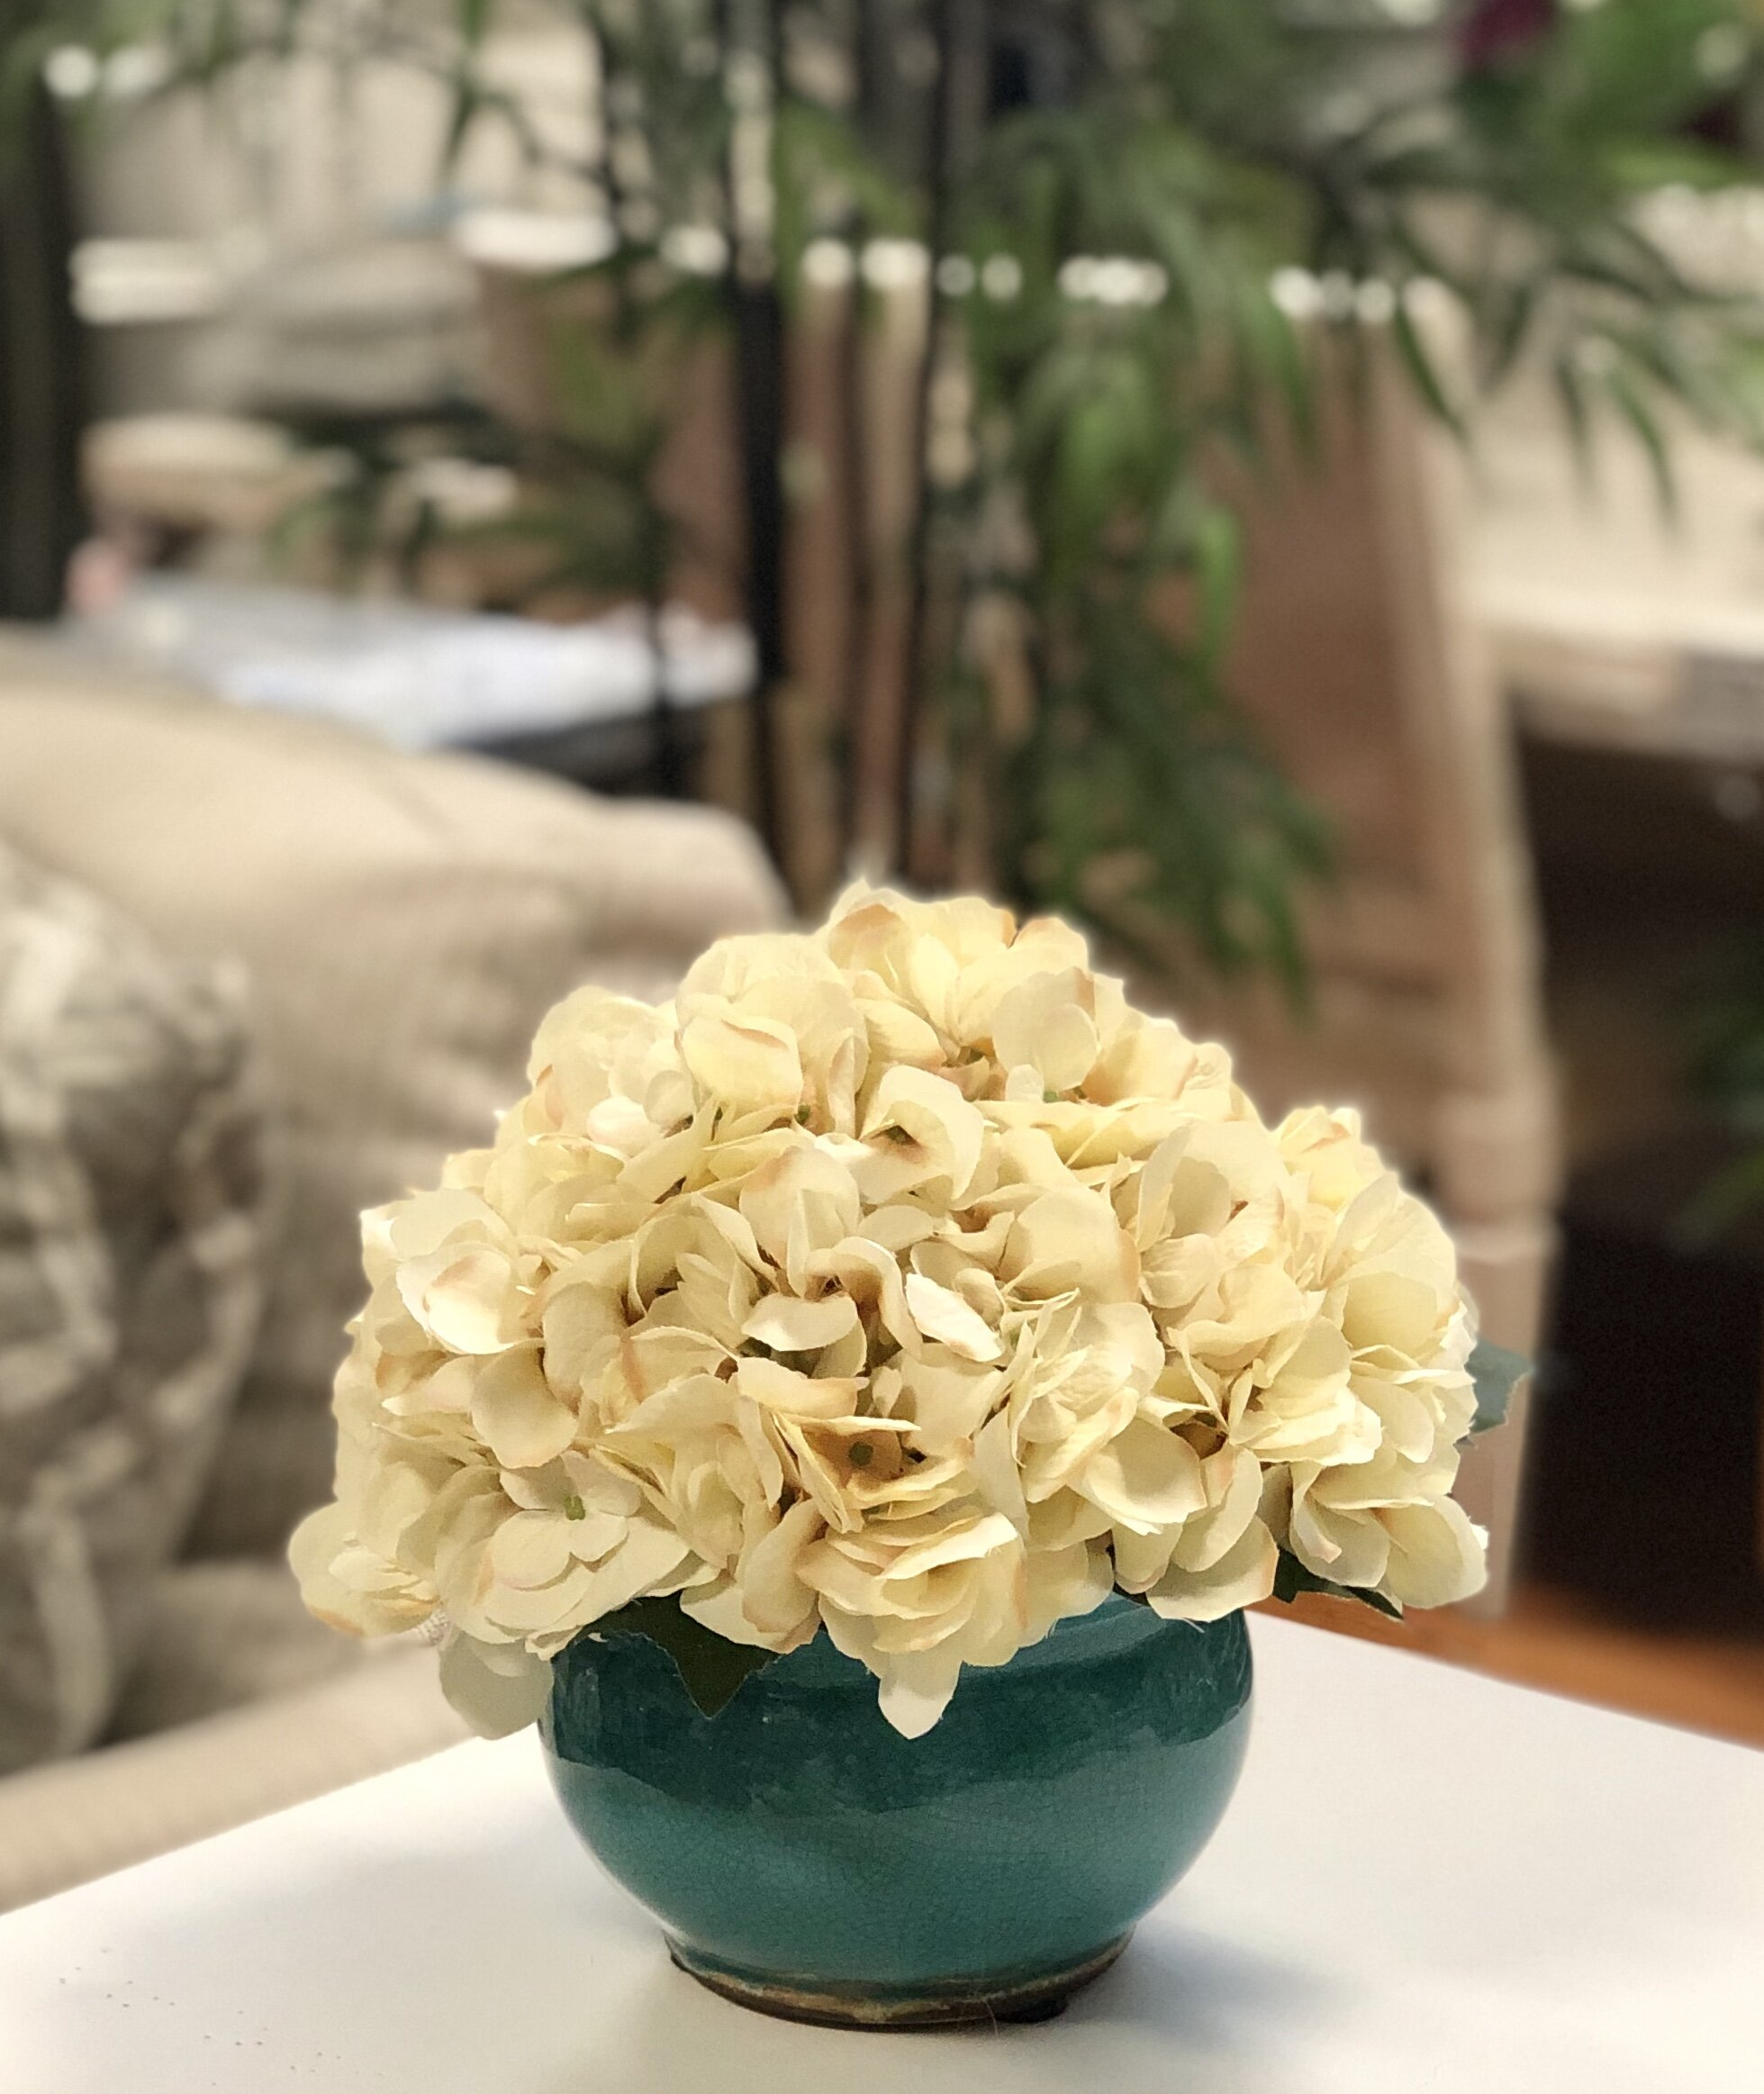 Rosecliff Heights Hydrangeas Floral Arrangement In Pot Wayfair